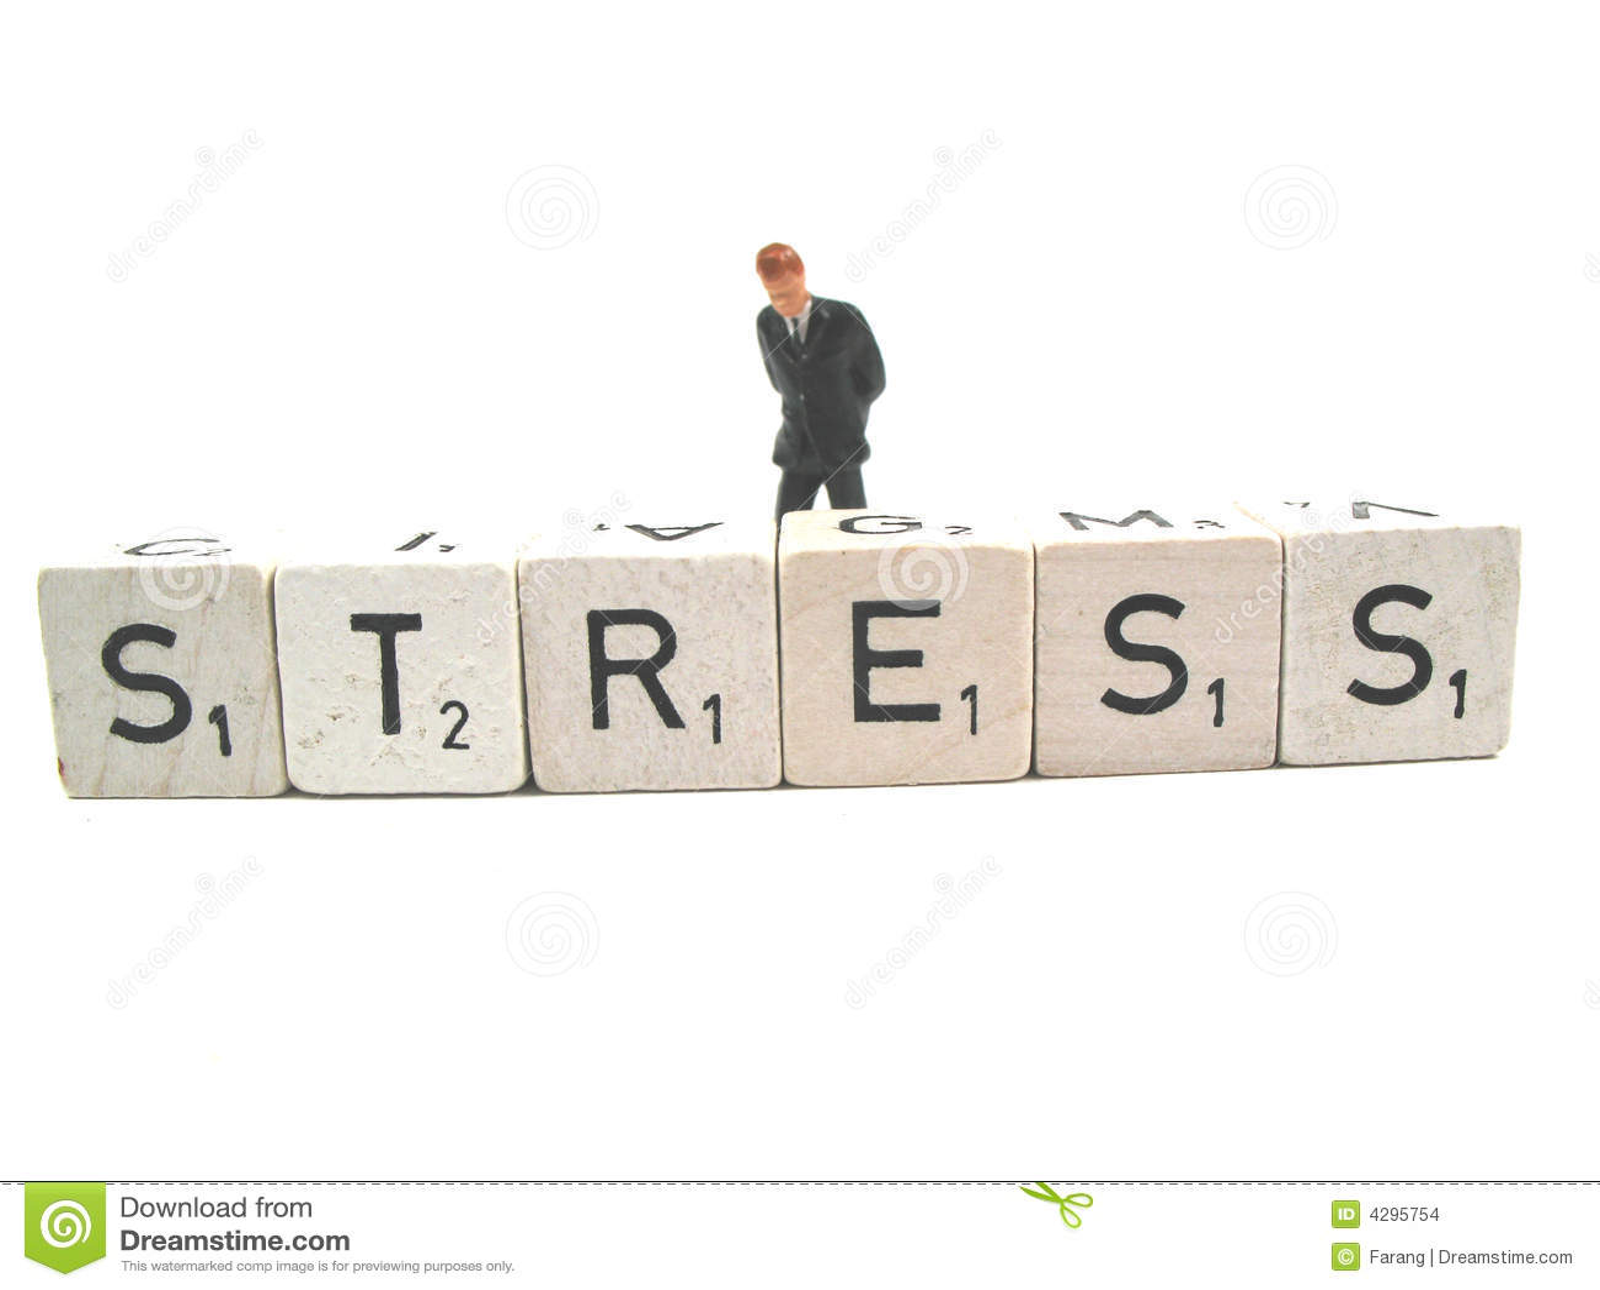 Having stress